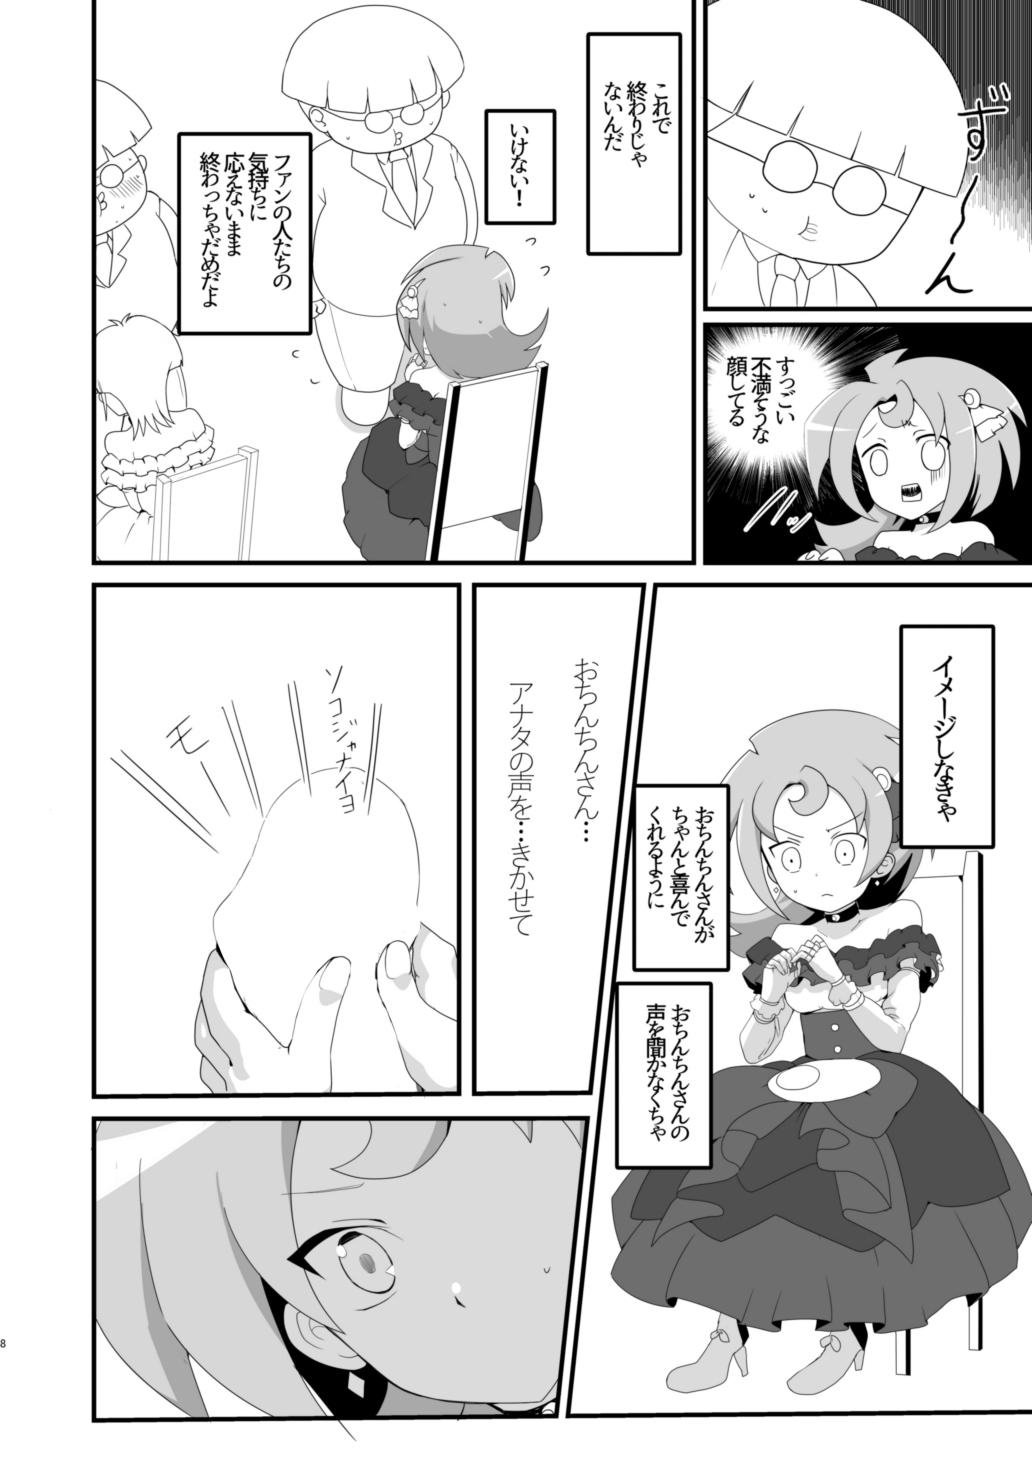 LunaAm O♂n♂n Akushuukai 6